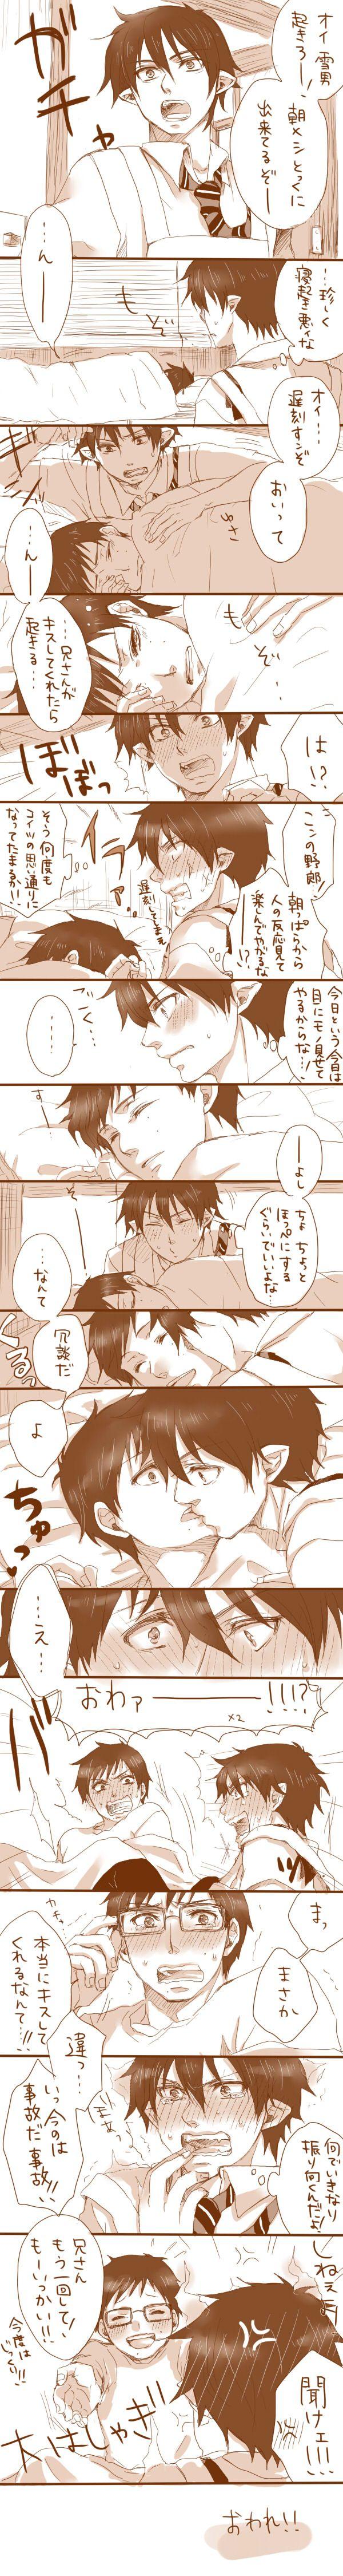 Tags: Anime, Bed, Incest, Twincest, Sharp Teeth, Ao no Exorcist, Okumura Rin